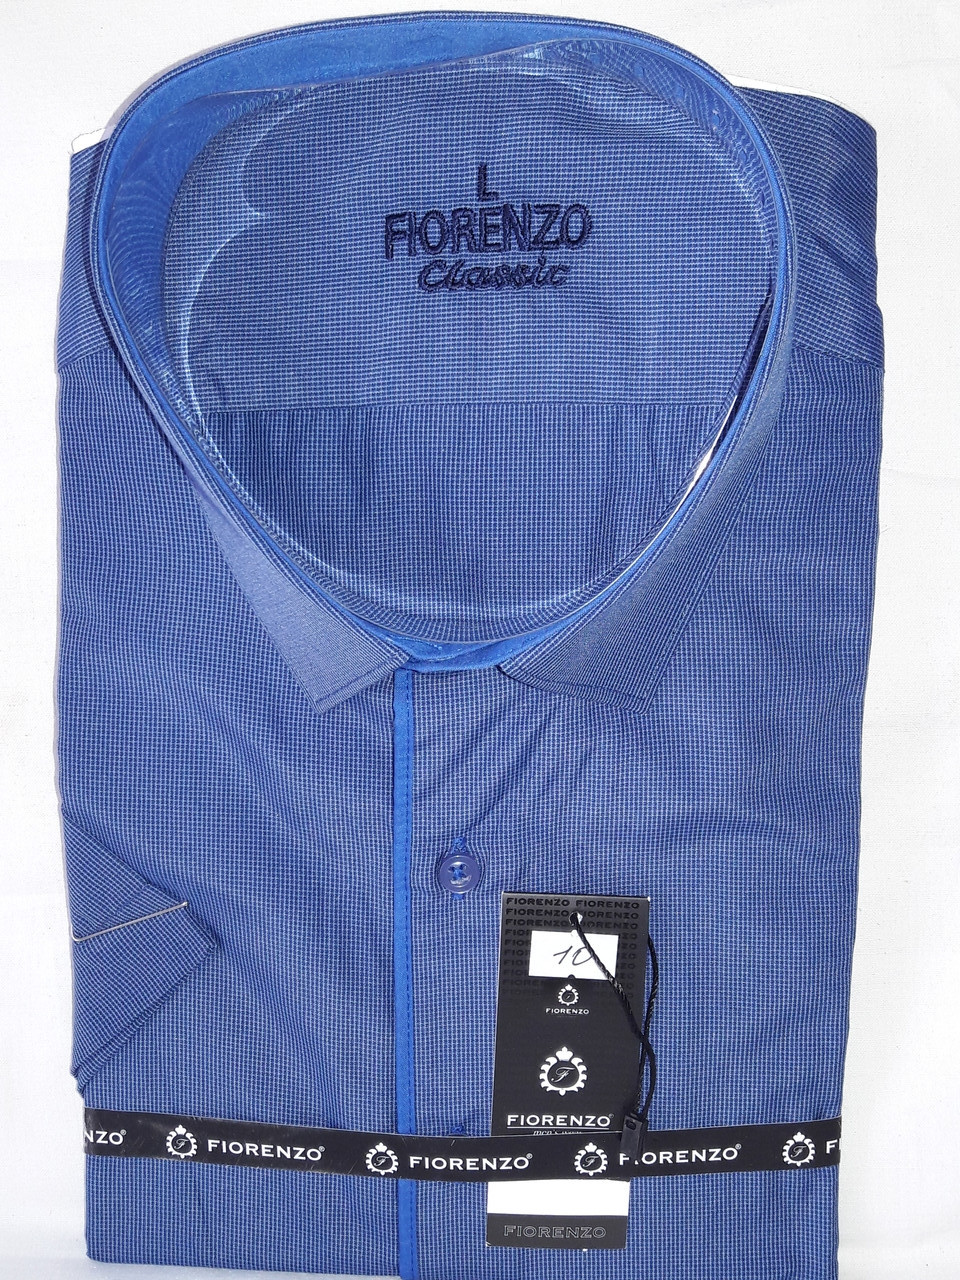 4a4e792fd95 Рубашка мужская с коротким рукавом vk-0010 Fiorenzo - Магазин Рубашек VIK в  Запорожье